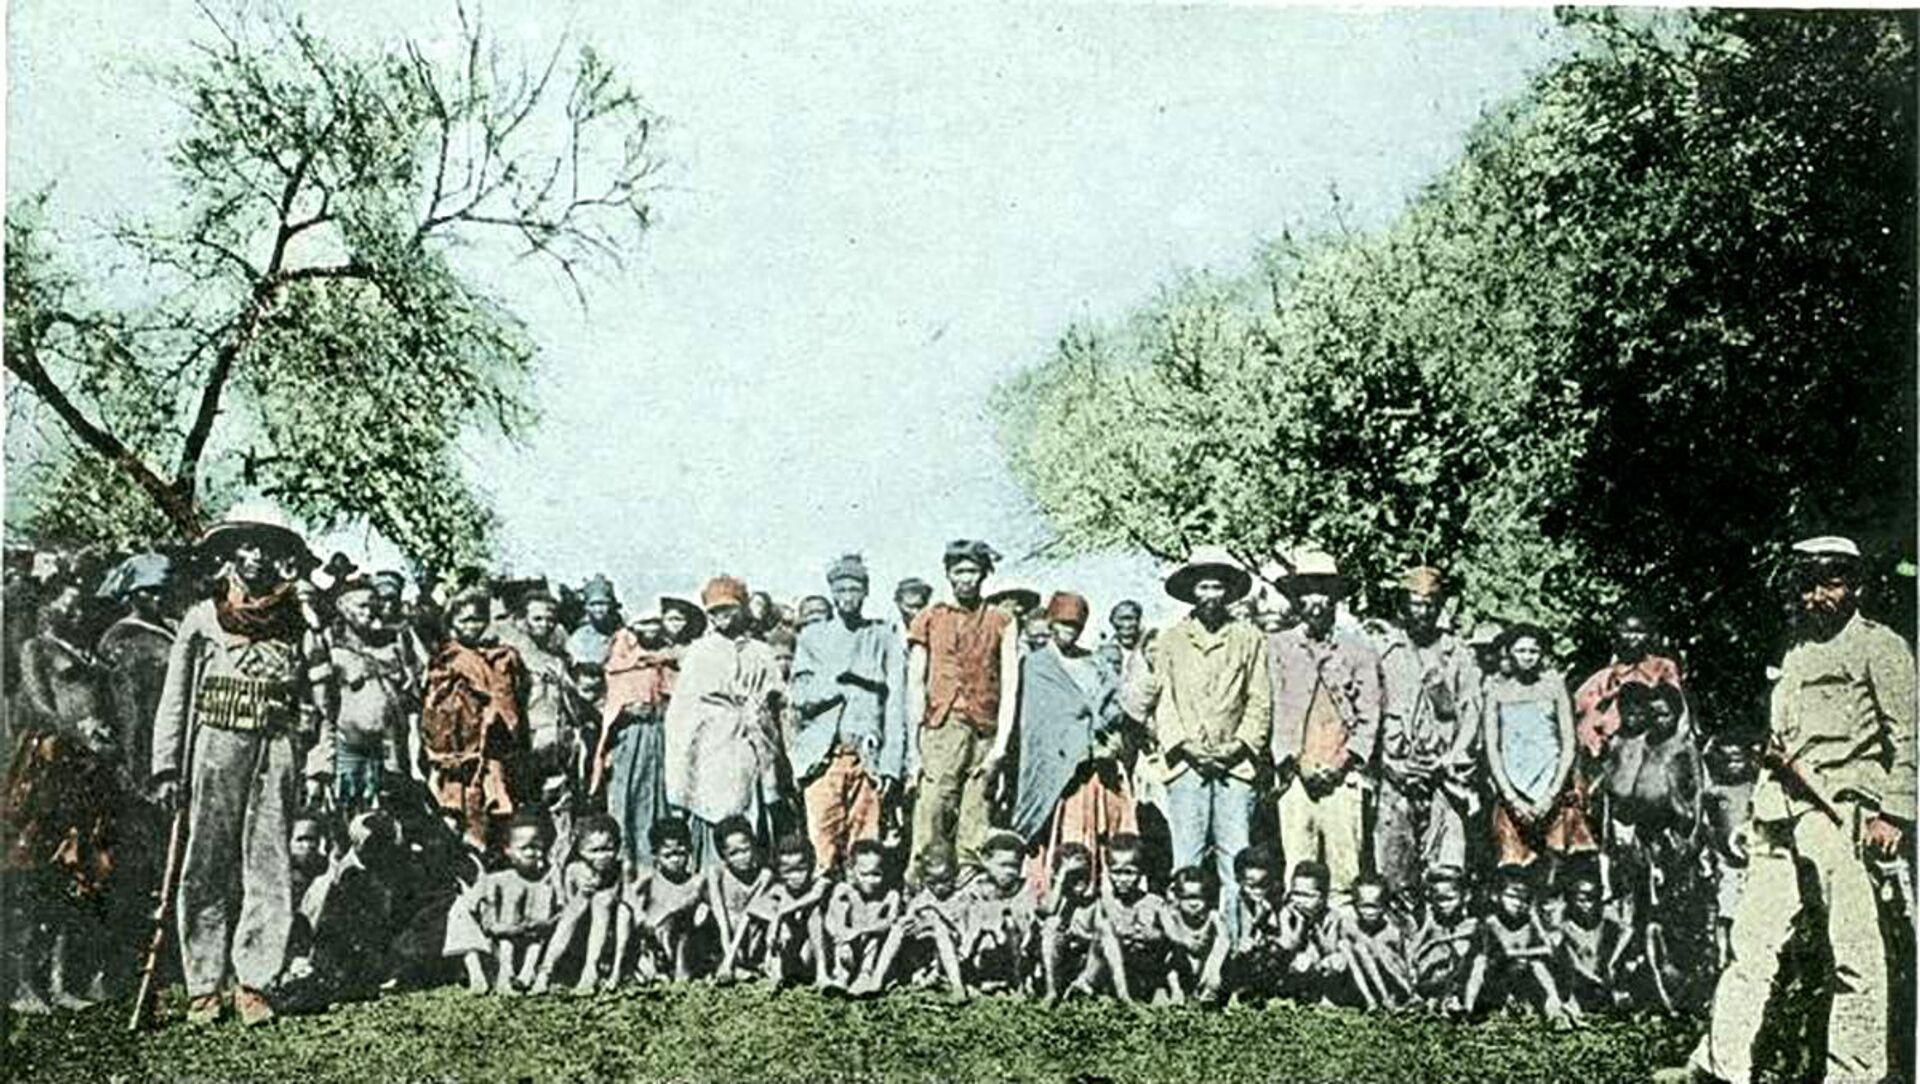 Plemię Herero, ok 1900 roku - Sputnik Polska, 1920, 05.04.2021